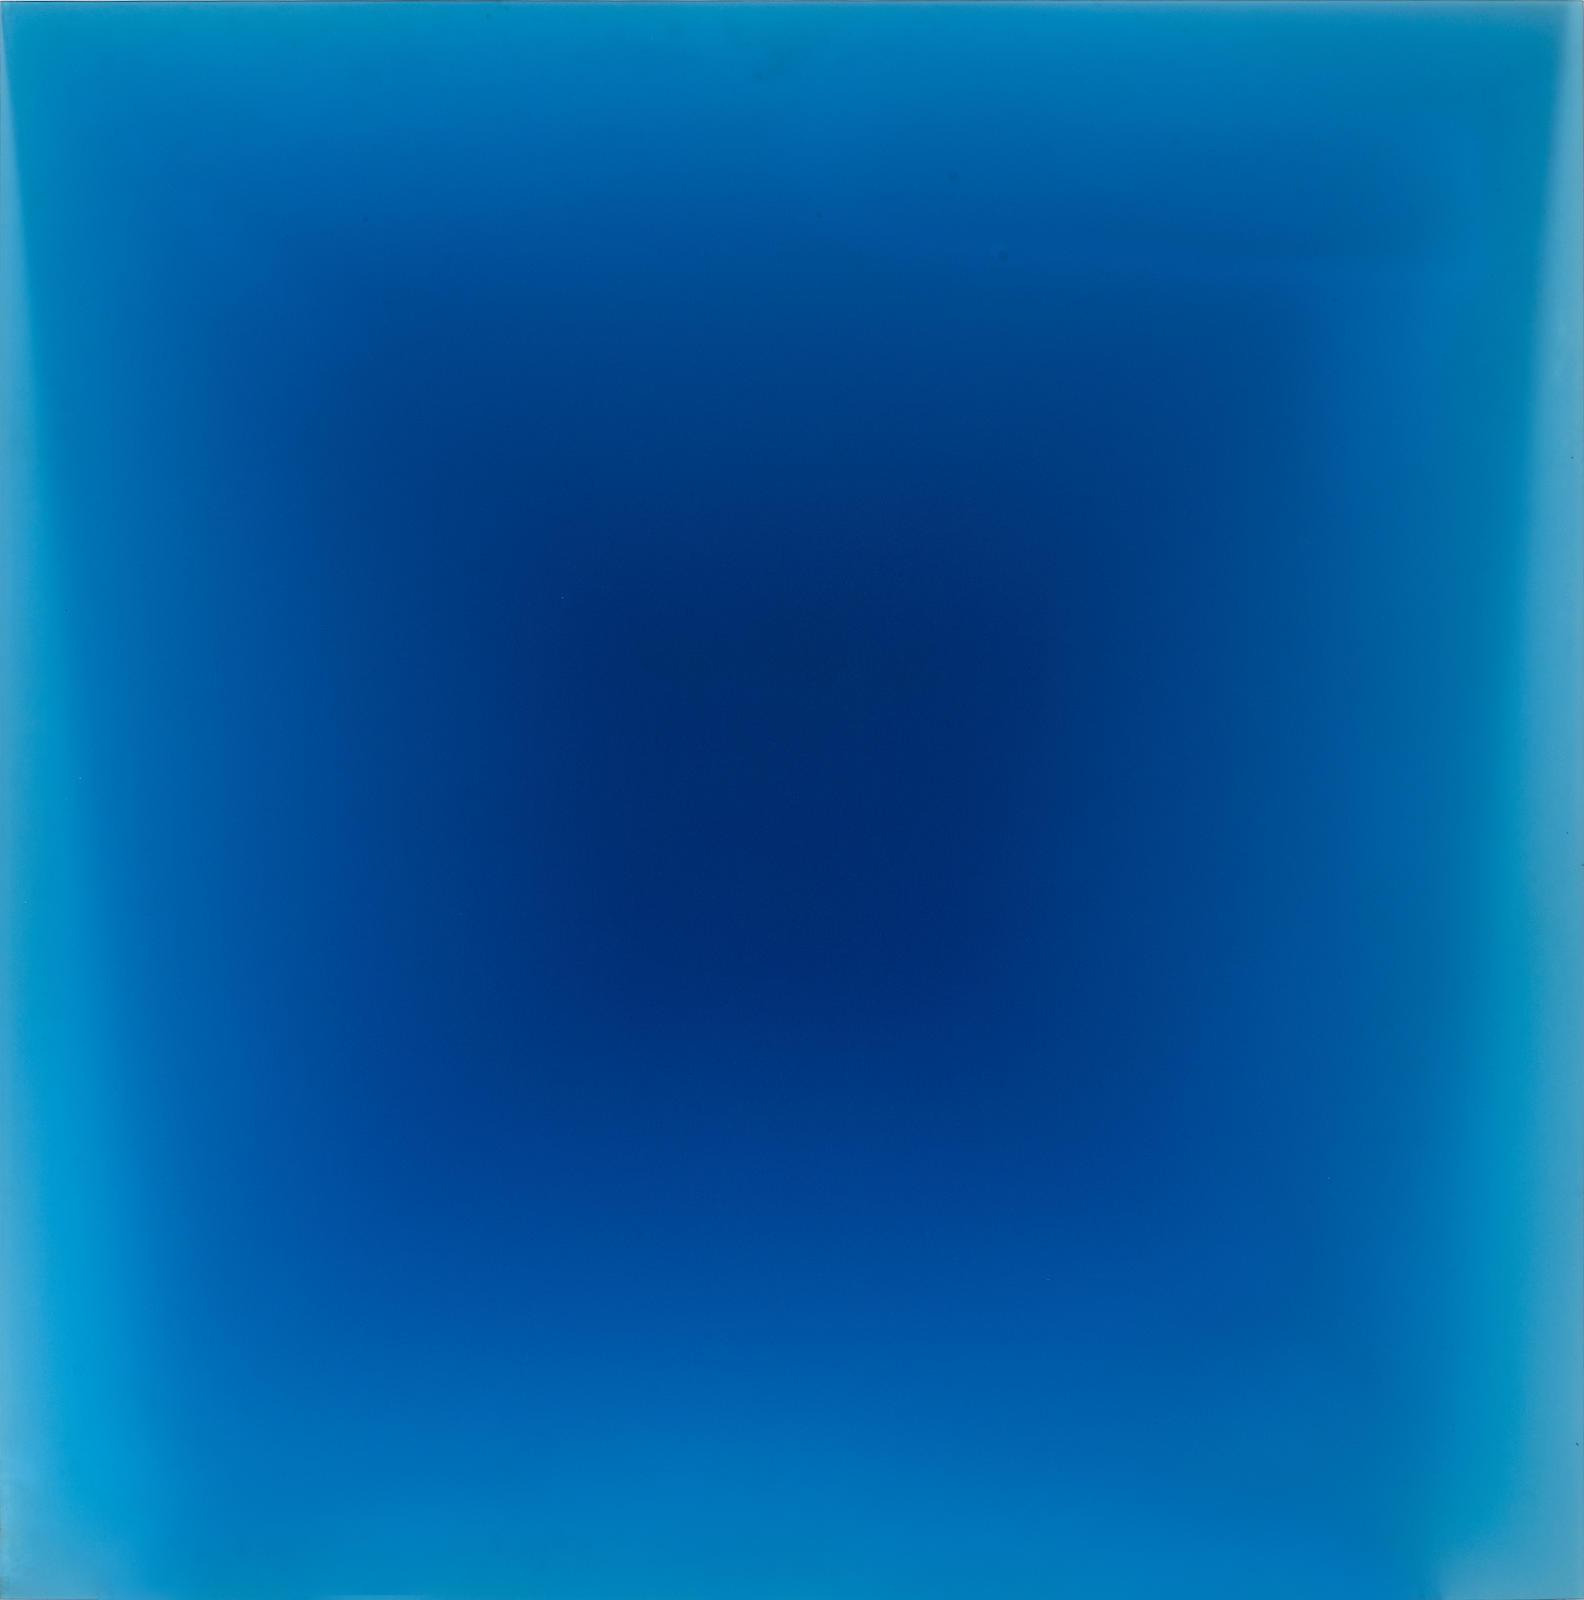 Peter Alexander-6/1/12 (Blue Square)-2012